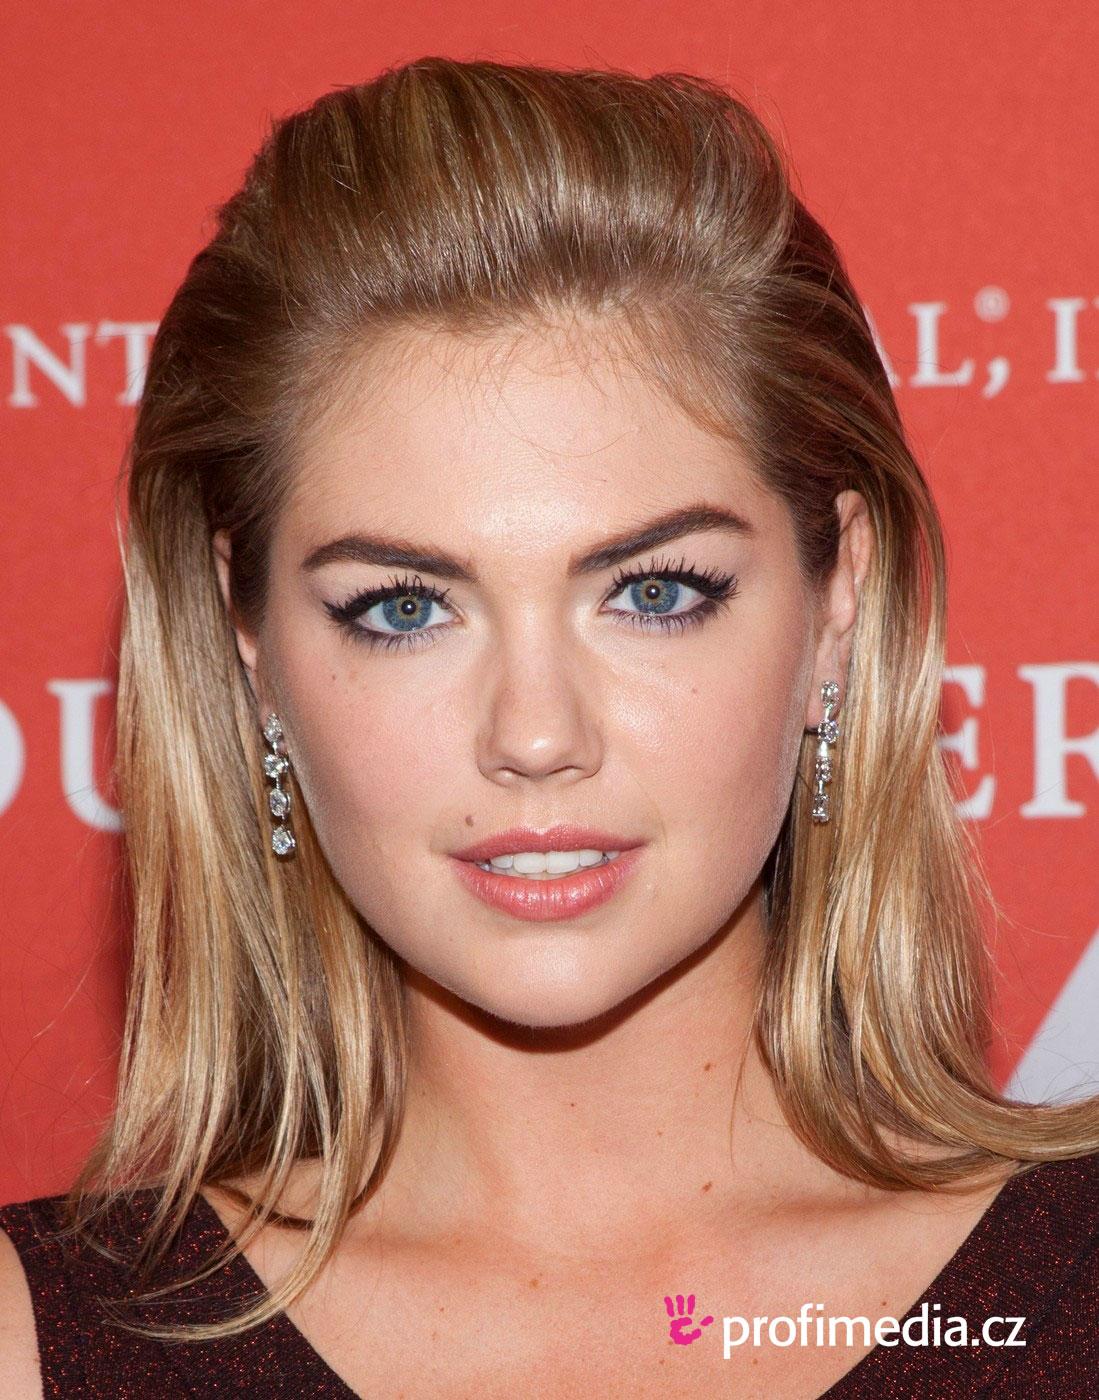 Kate Upton Hairstyle Easyhairstyler